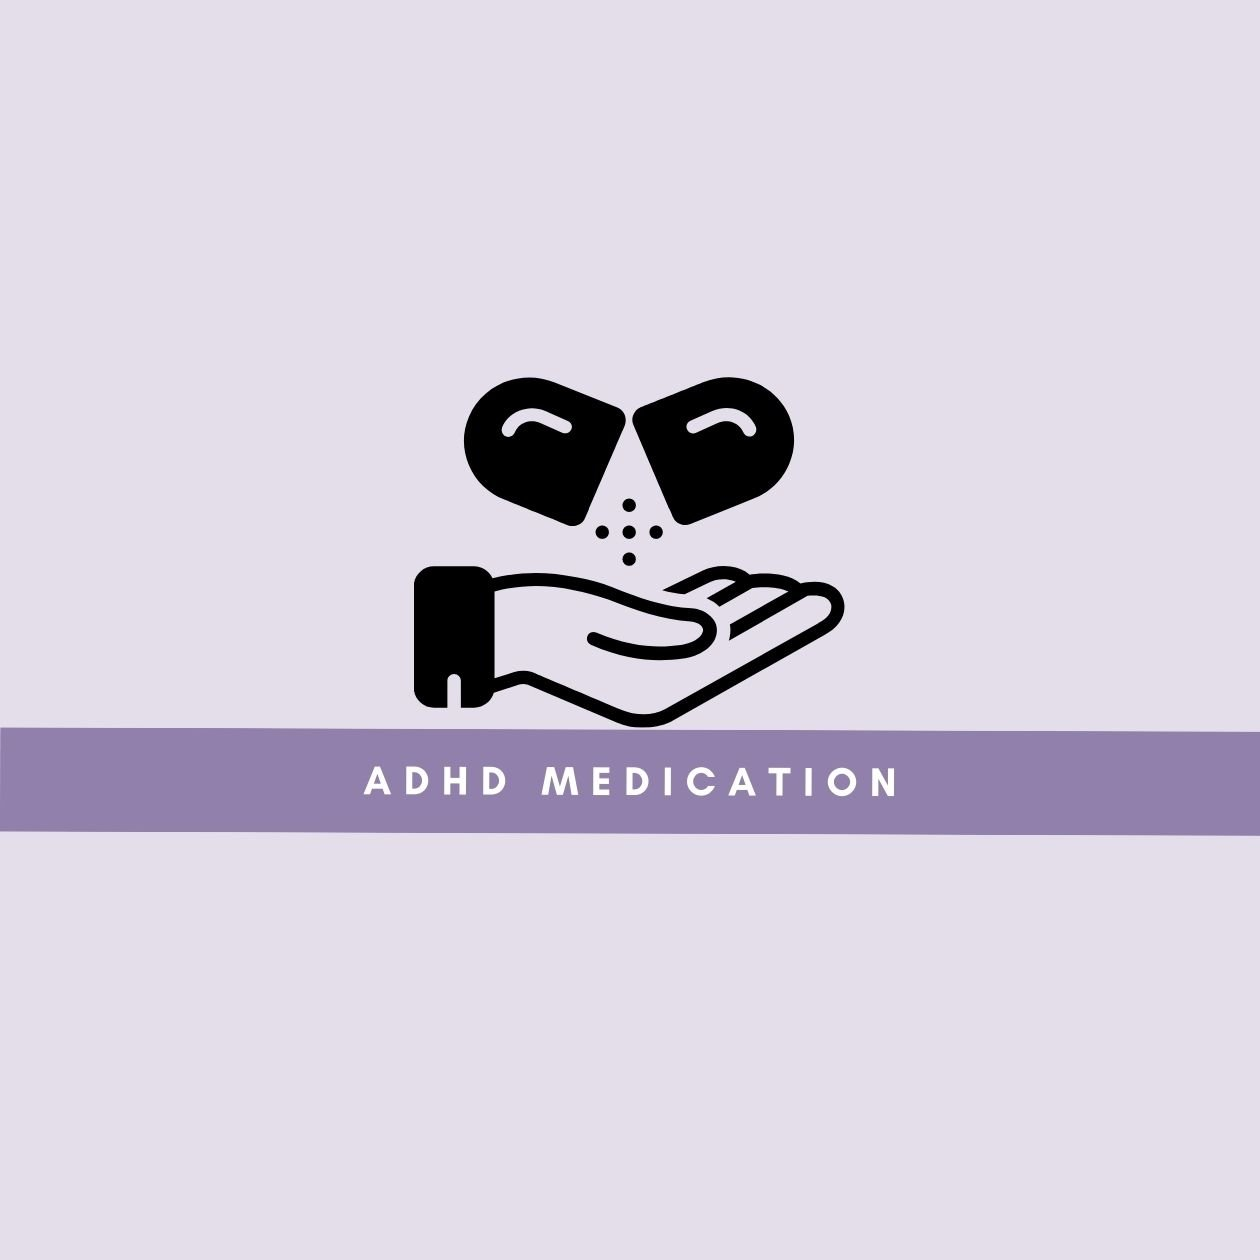 Adhd medication: an illustration